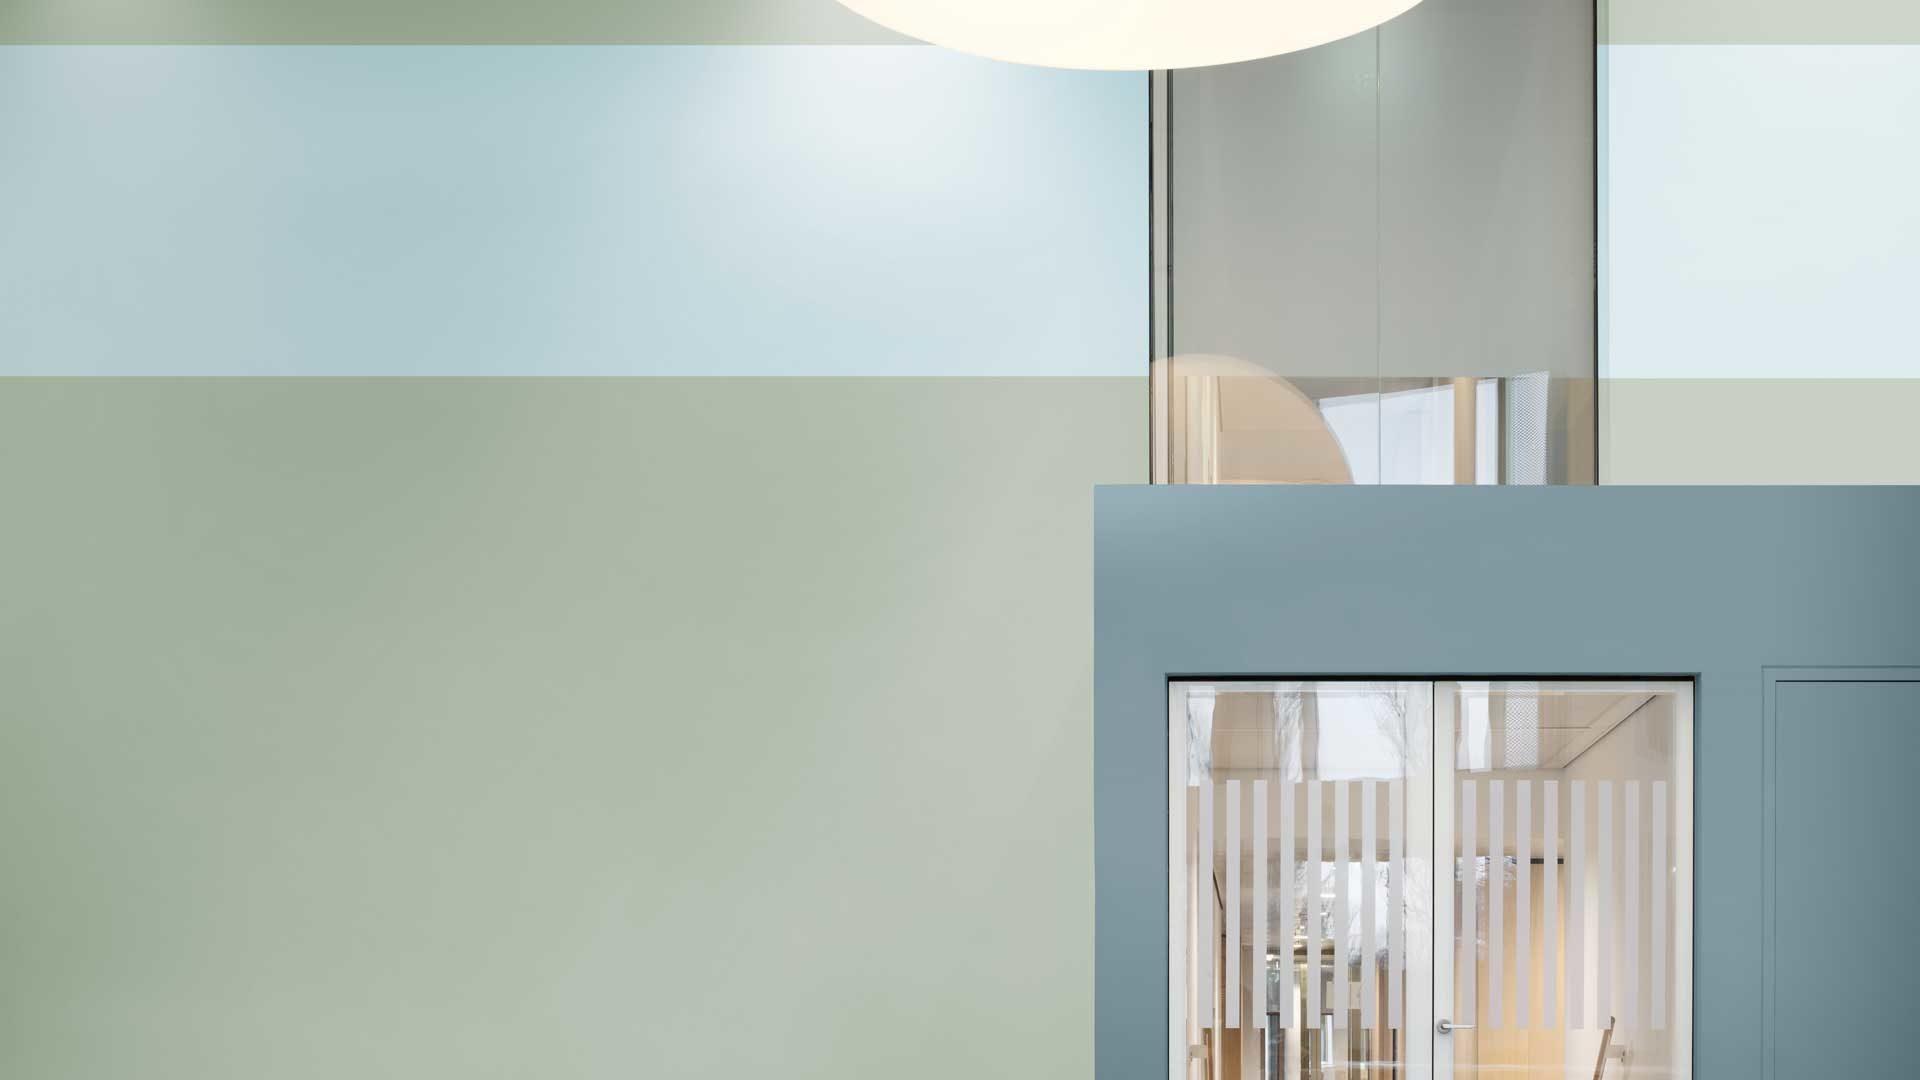 Tendenze-colore-ufficio-2020-phSikkens-AkzoNobel-Level-Office-Landscape